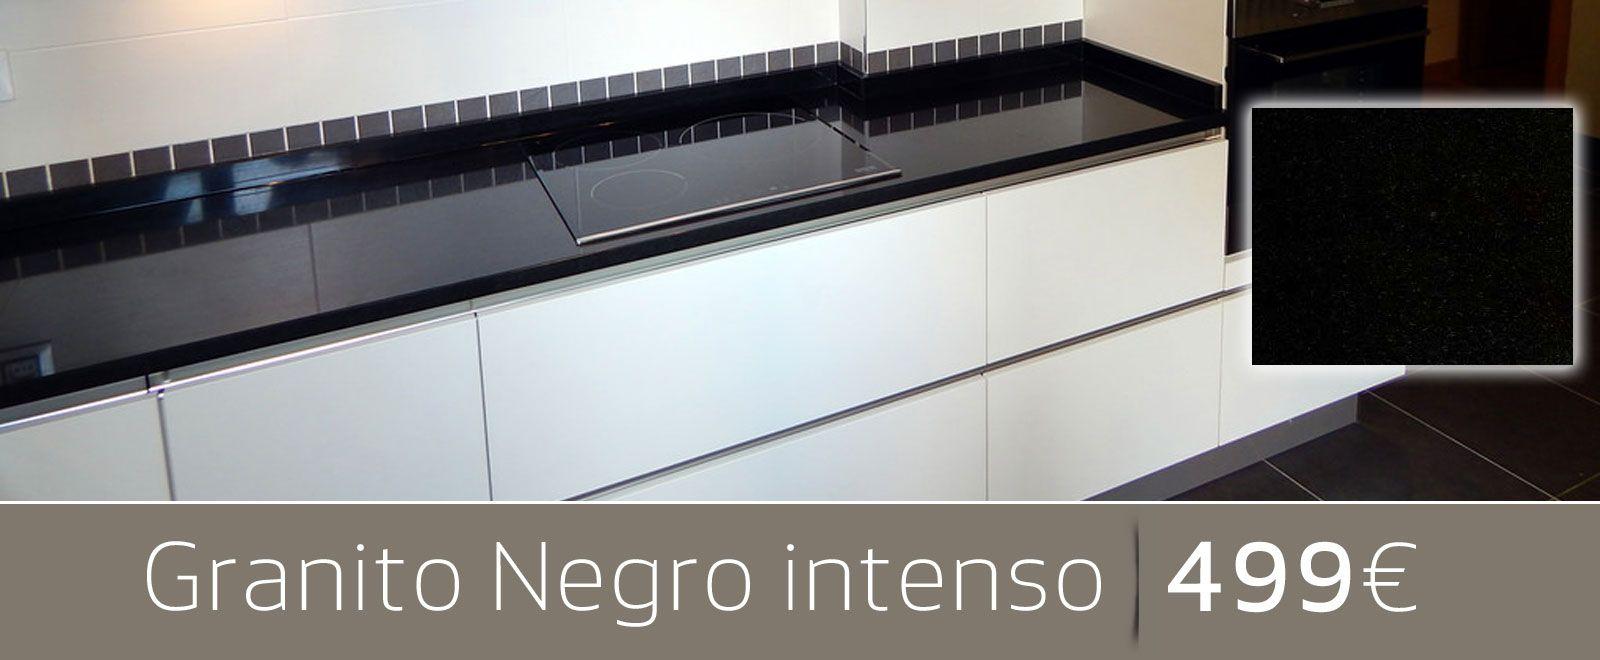 oferta encimera granito negro encicruz encimeras silestone dekton neolith naturamia http www. Black Bedroom Furniture Sets. Home Design Ideas